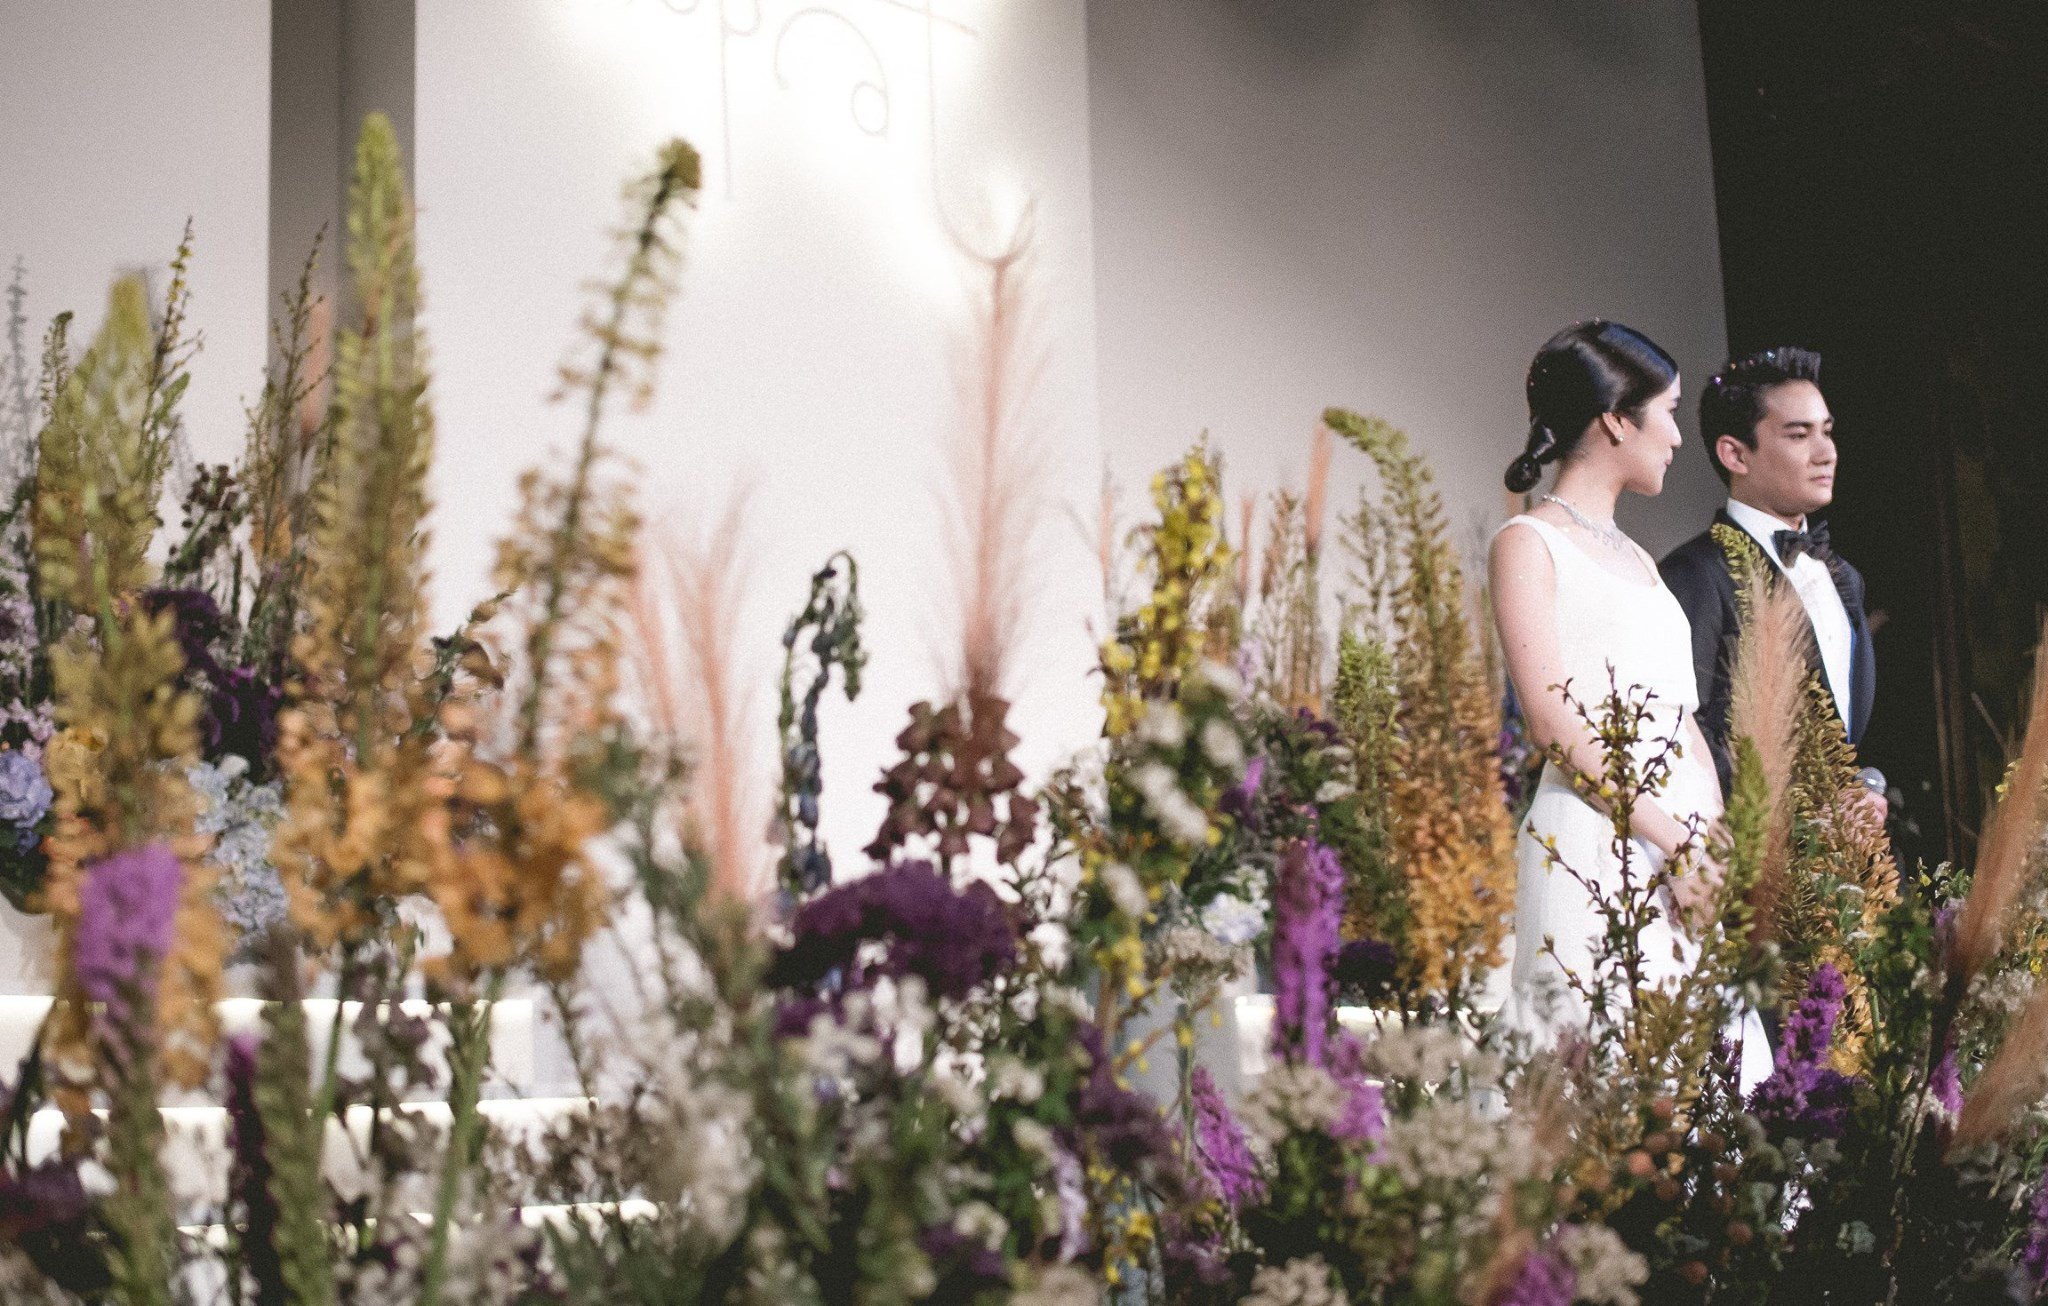 Bouquet - Muscari and Oxypetalum